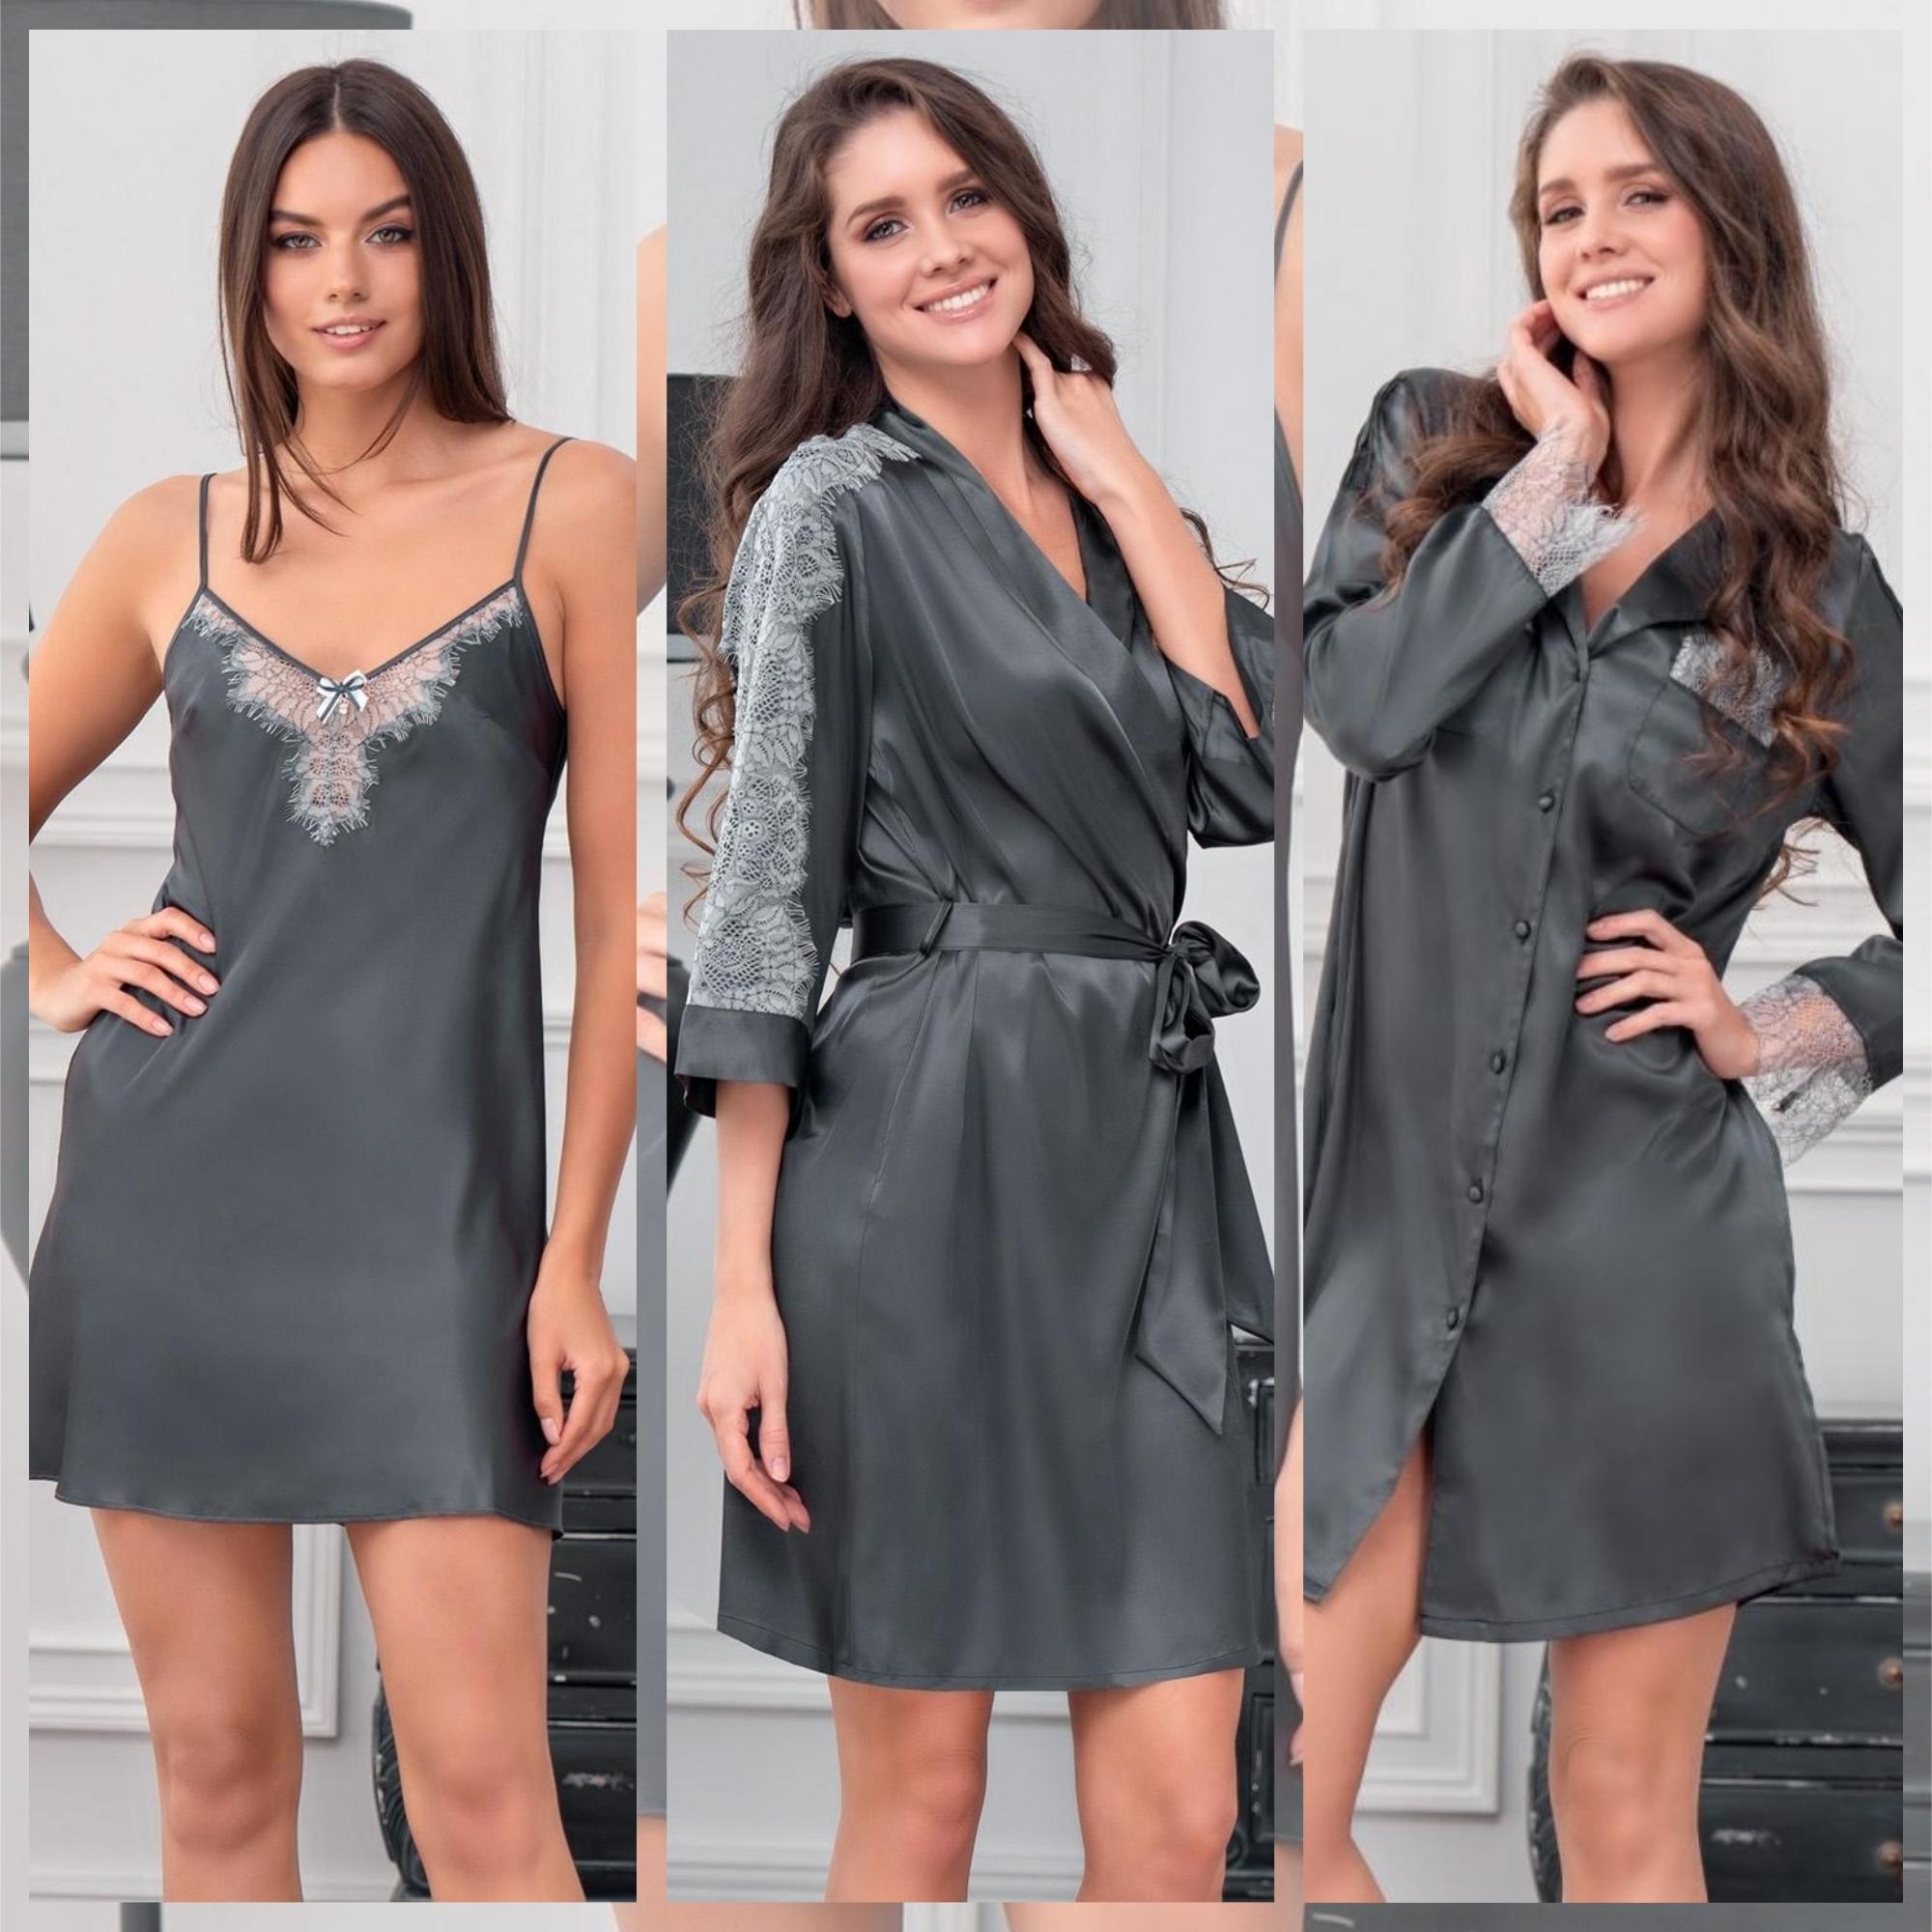 Женские сорочки и халаты Mia-Mia купить